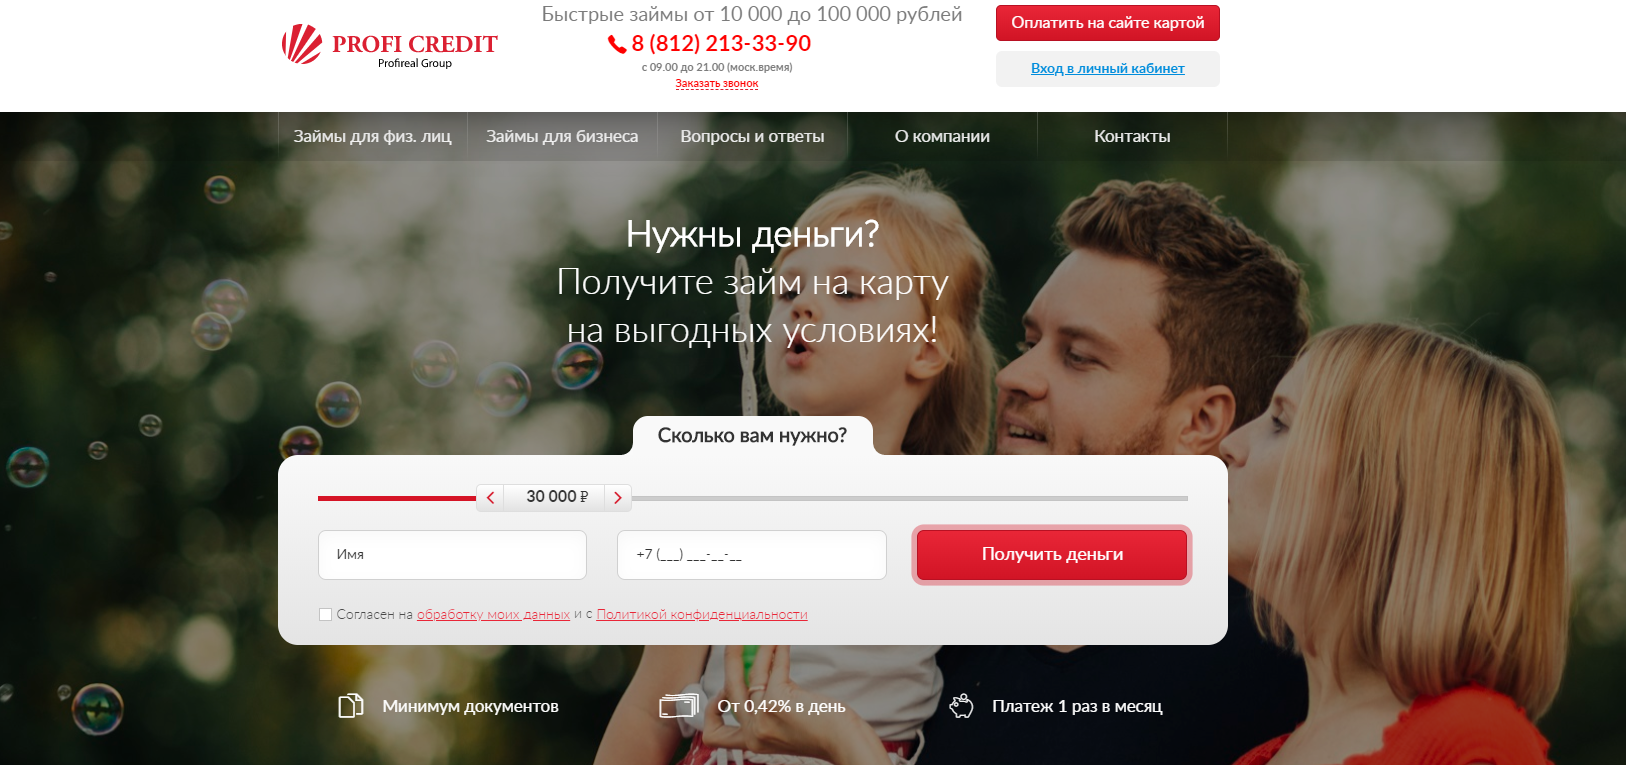 profi-kredit-otzyvy_